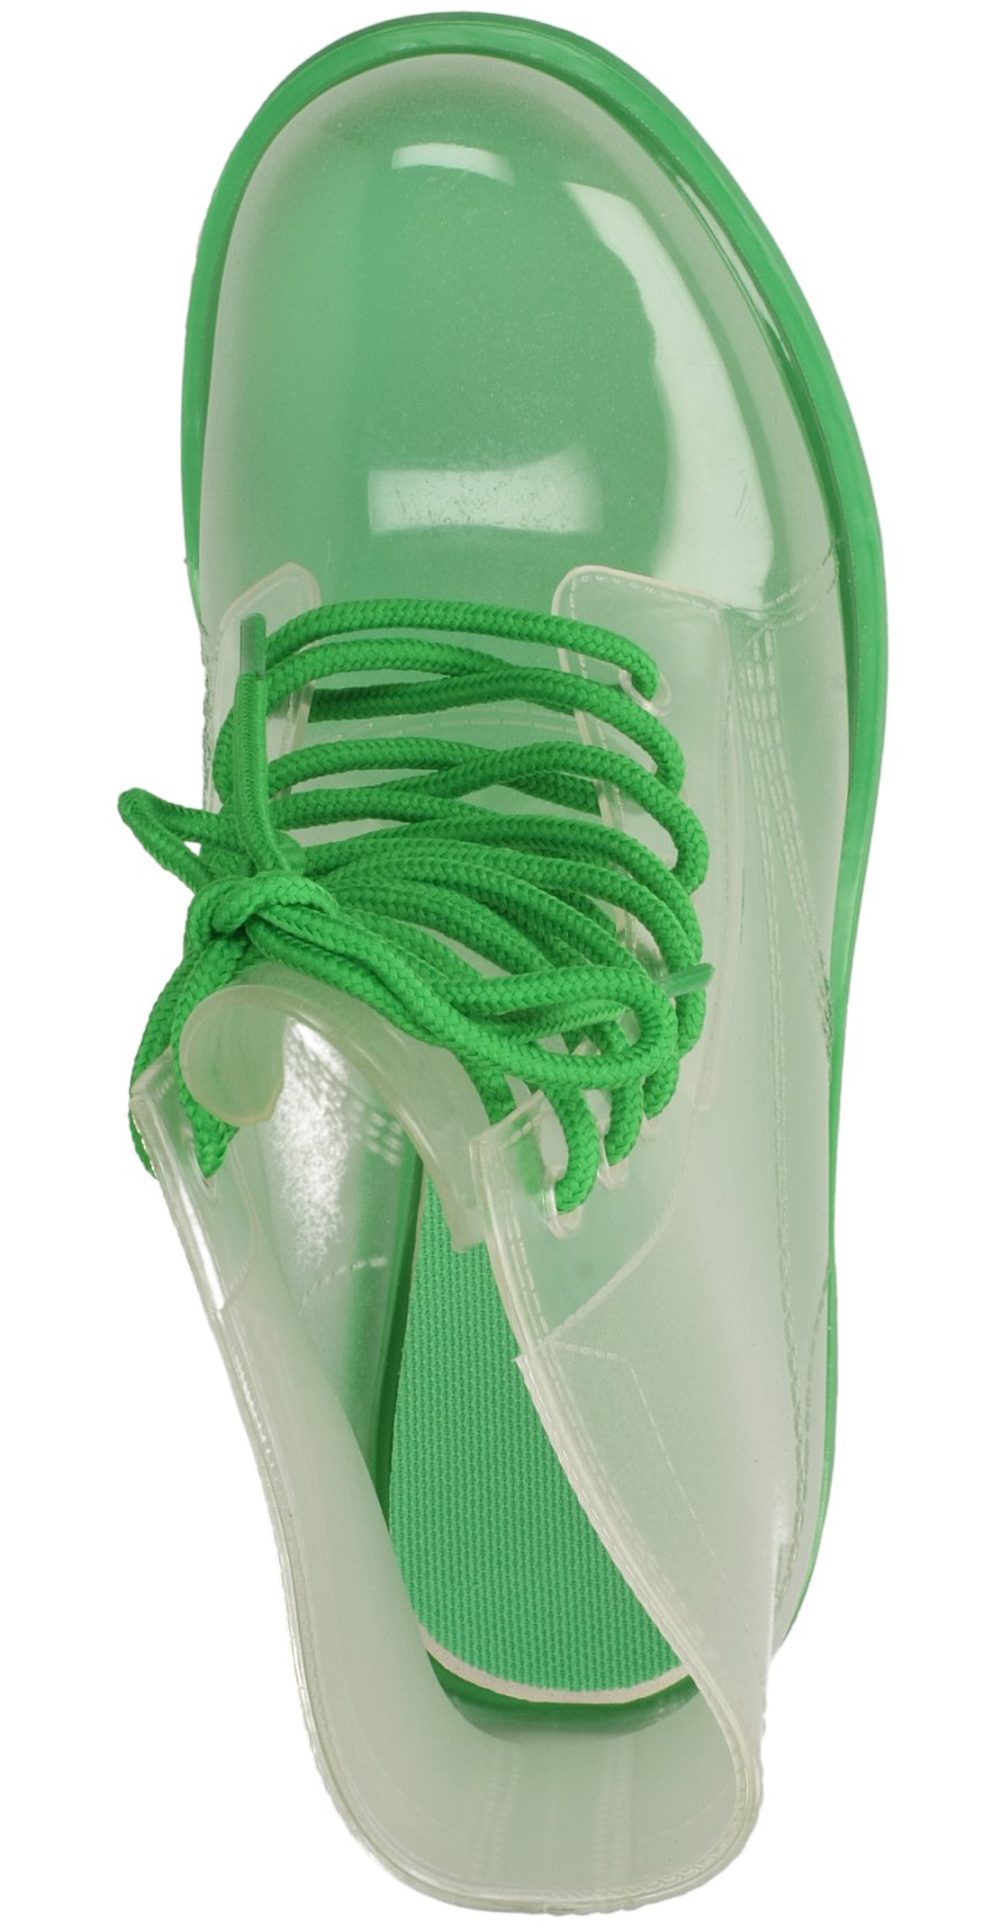 KALOSZE CASU MDX-01 kolor zielony